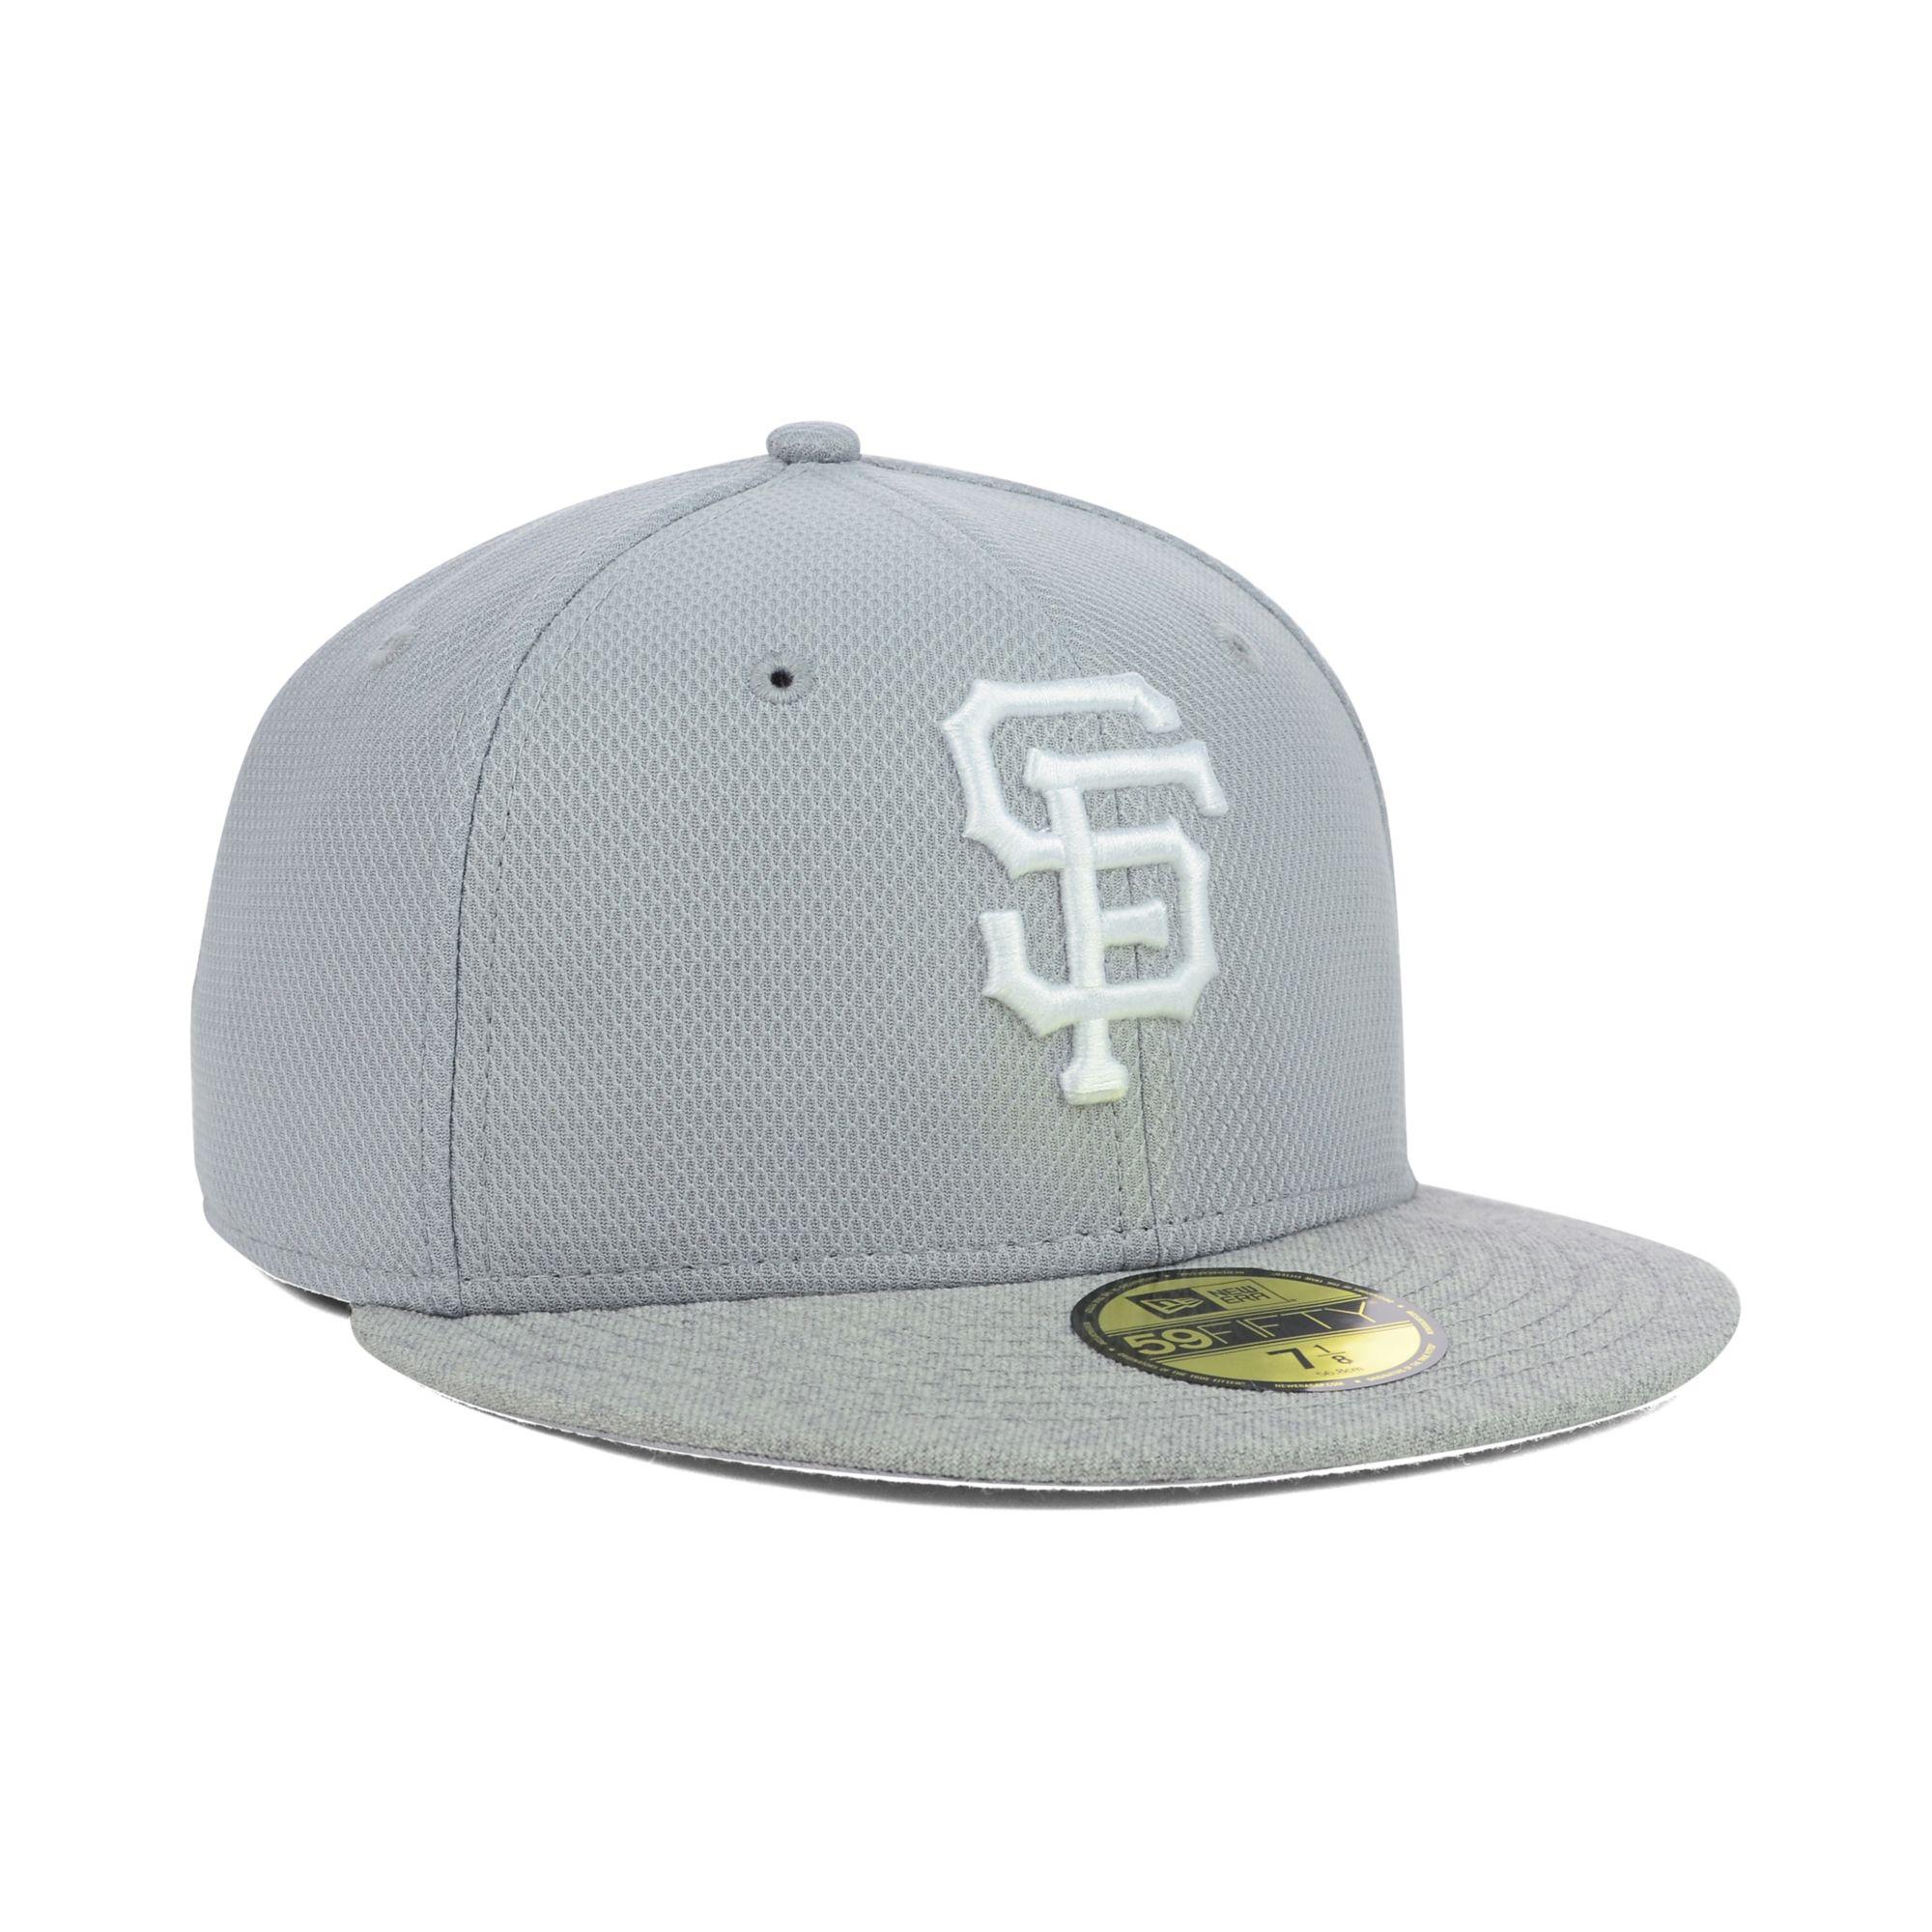 finest selection 623c2 3d3e5 ... where can i buy lyst ktz san francisco giants diamond heather 59fifty  cap in gray 9365e